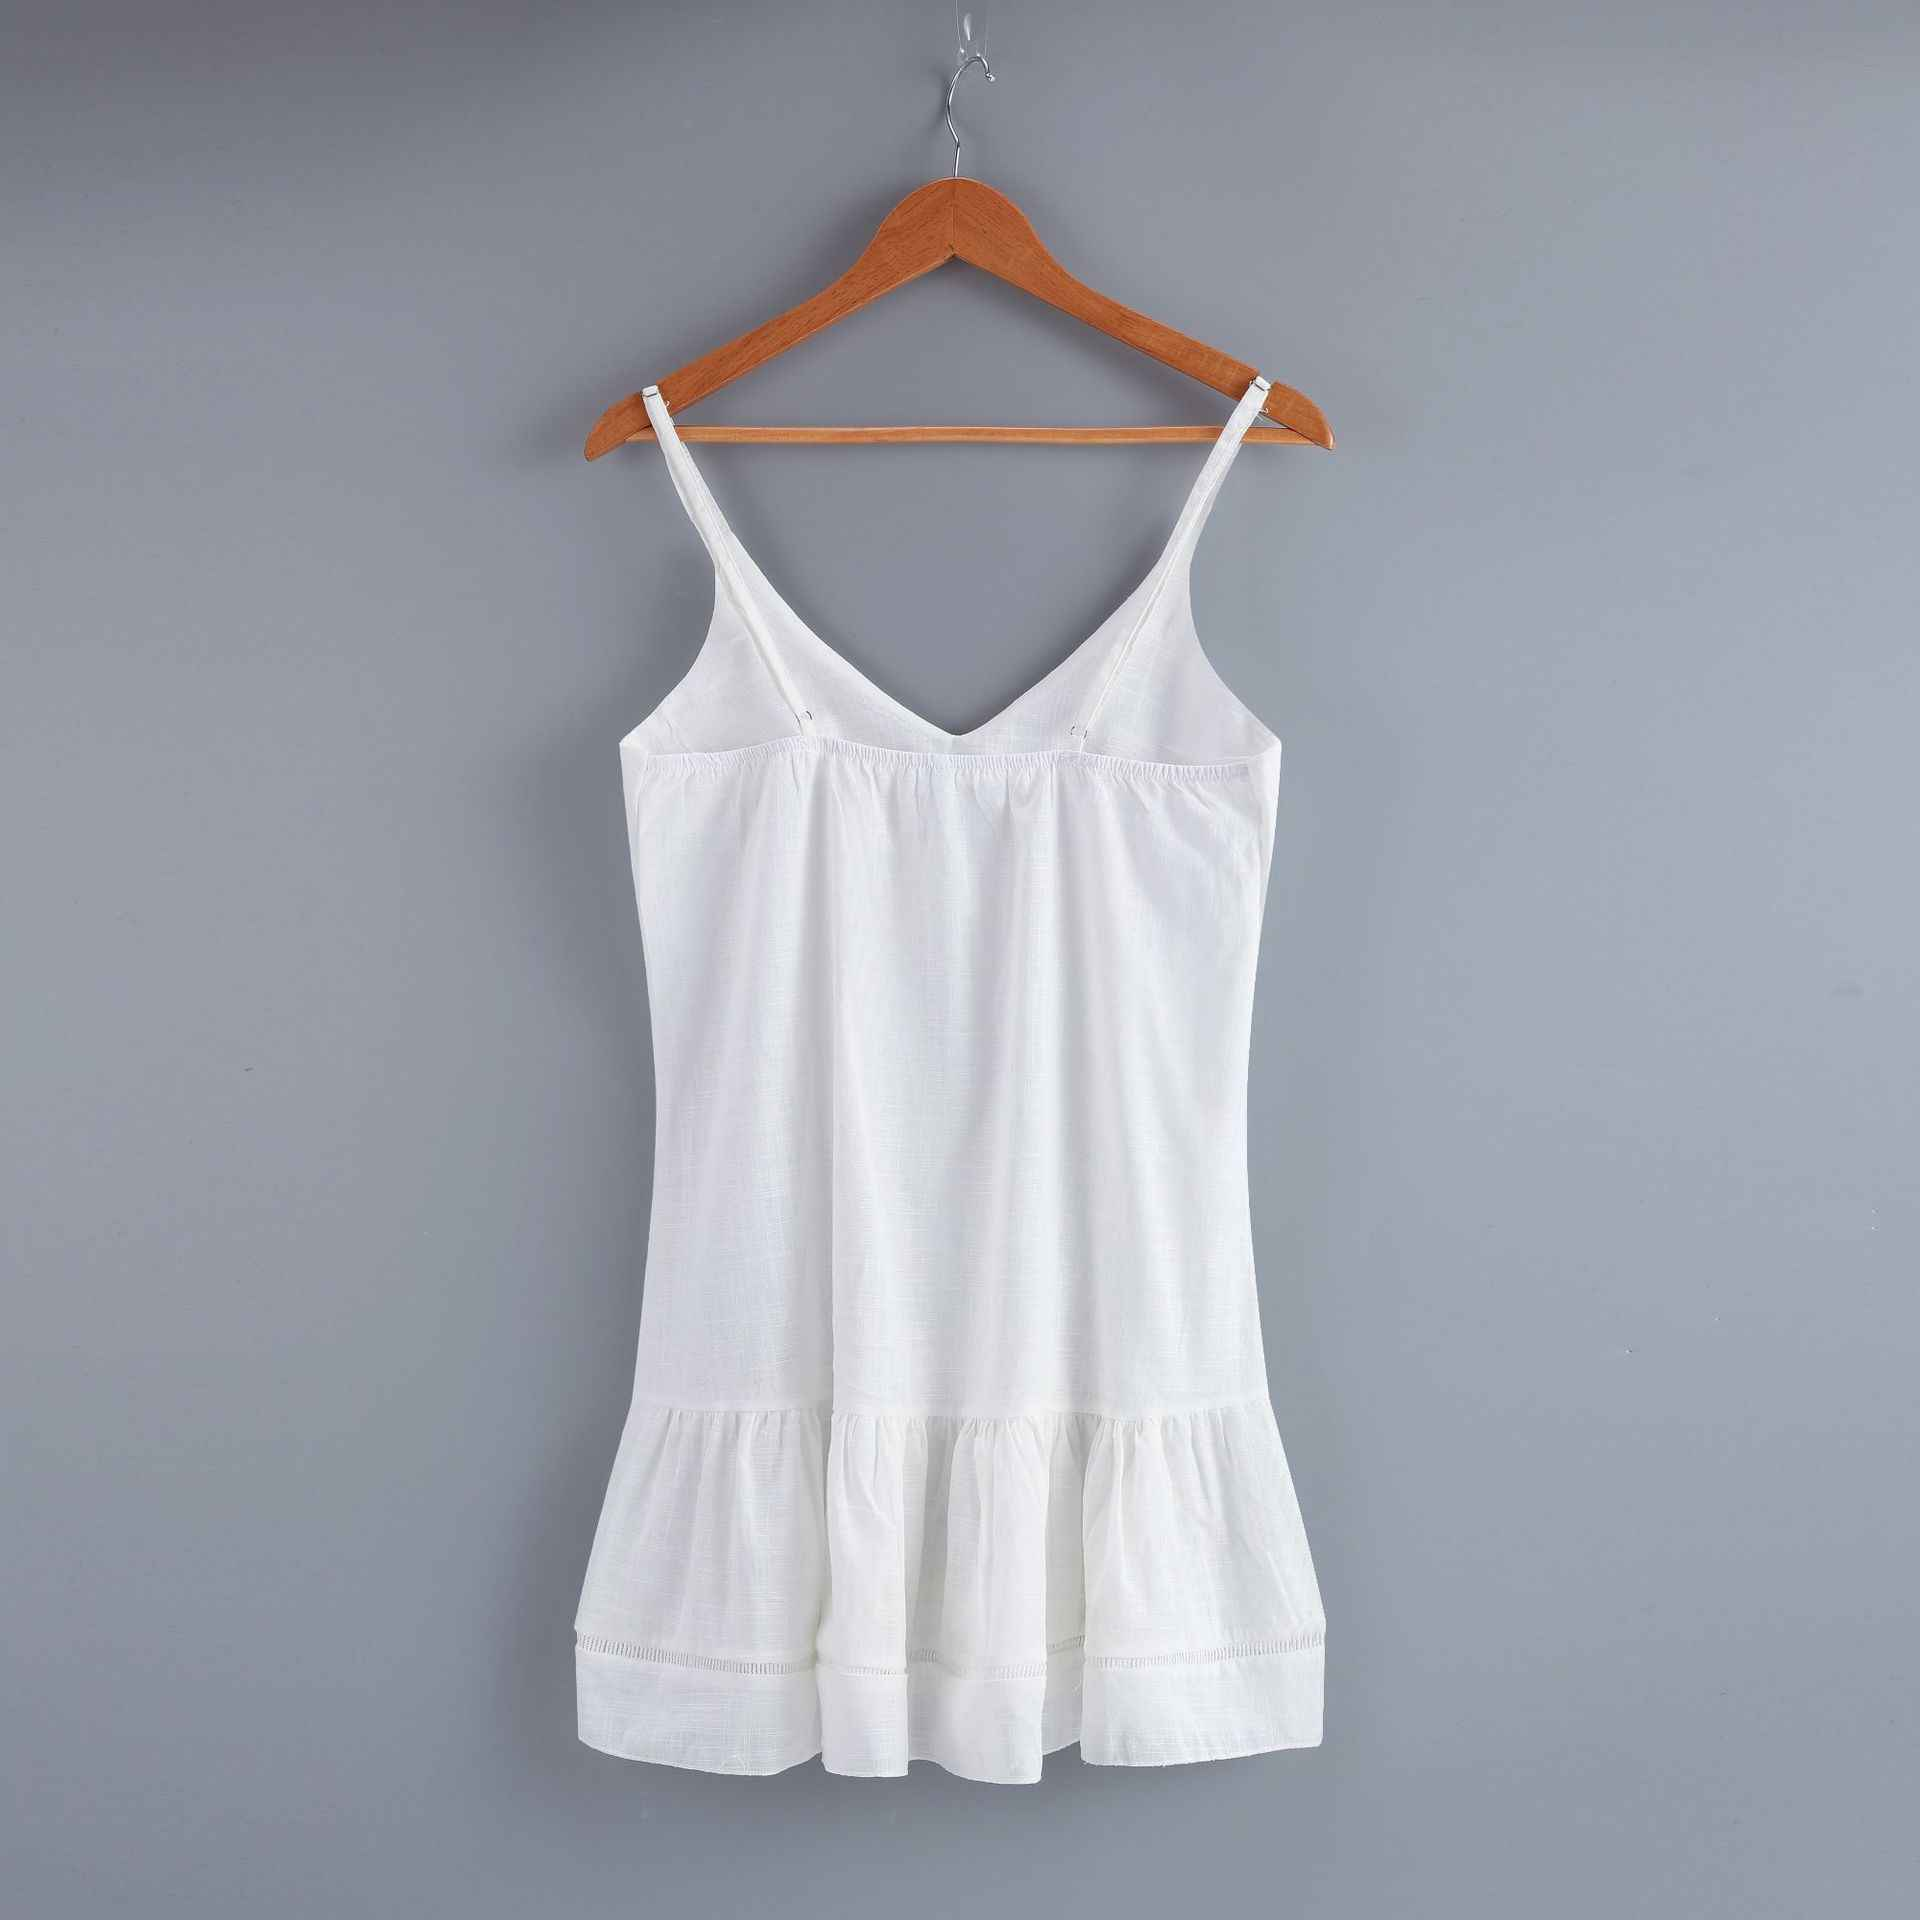 2019 Sexy blanc profond col en V épaules dénudées licou à volants Mini robe femmes robe moulante robe blanche tenue de club